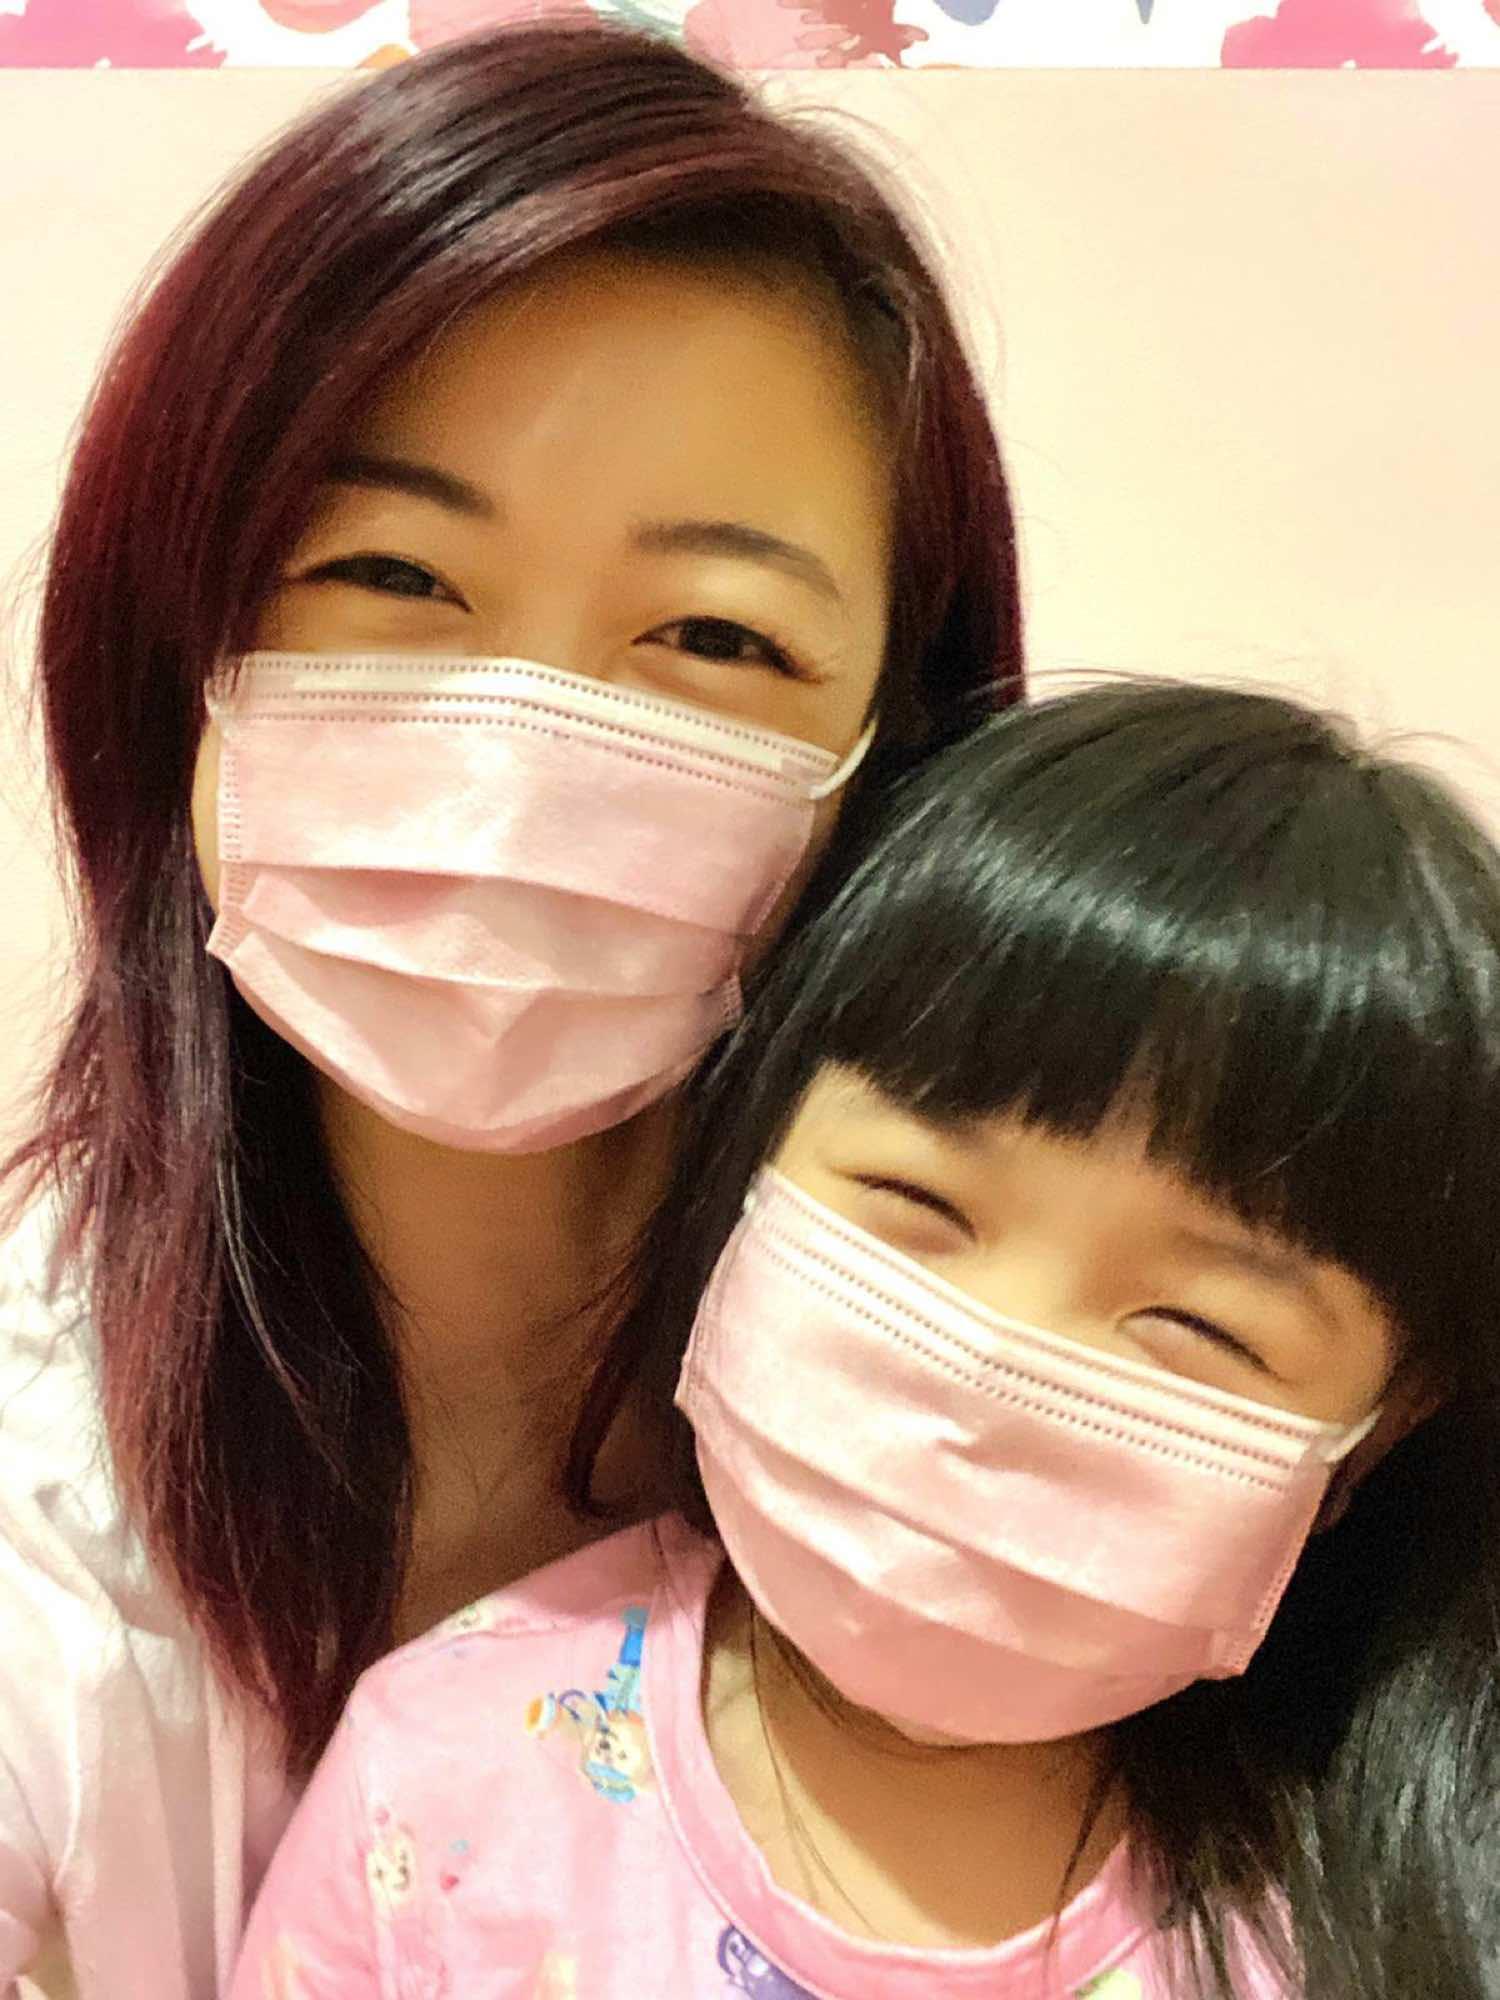 「 Maskology 口罩.學 」全新學童口罩 運動必備 Nanotech 納米口罩